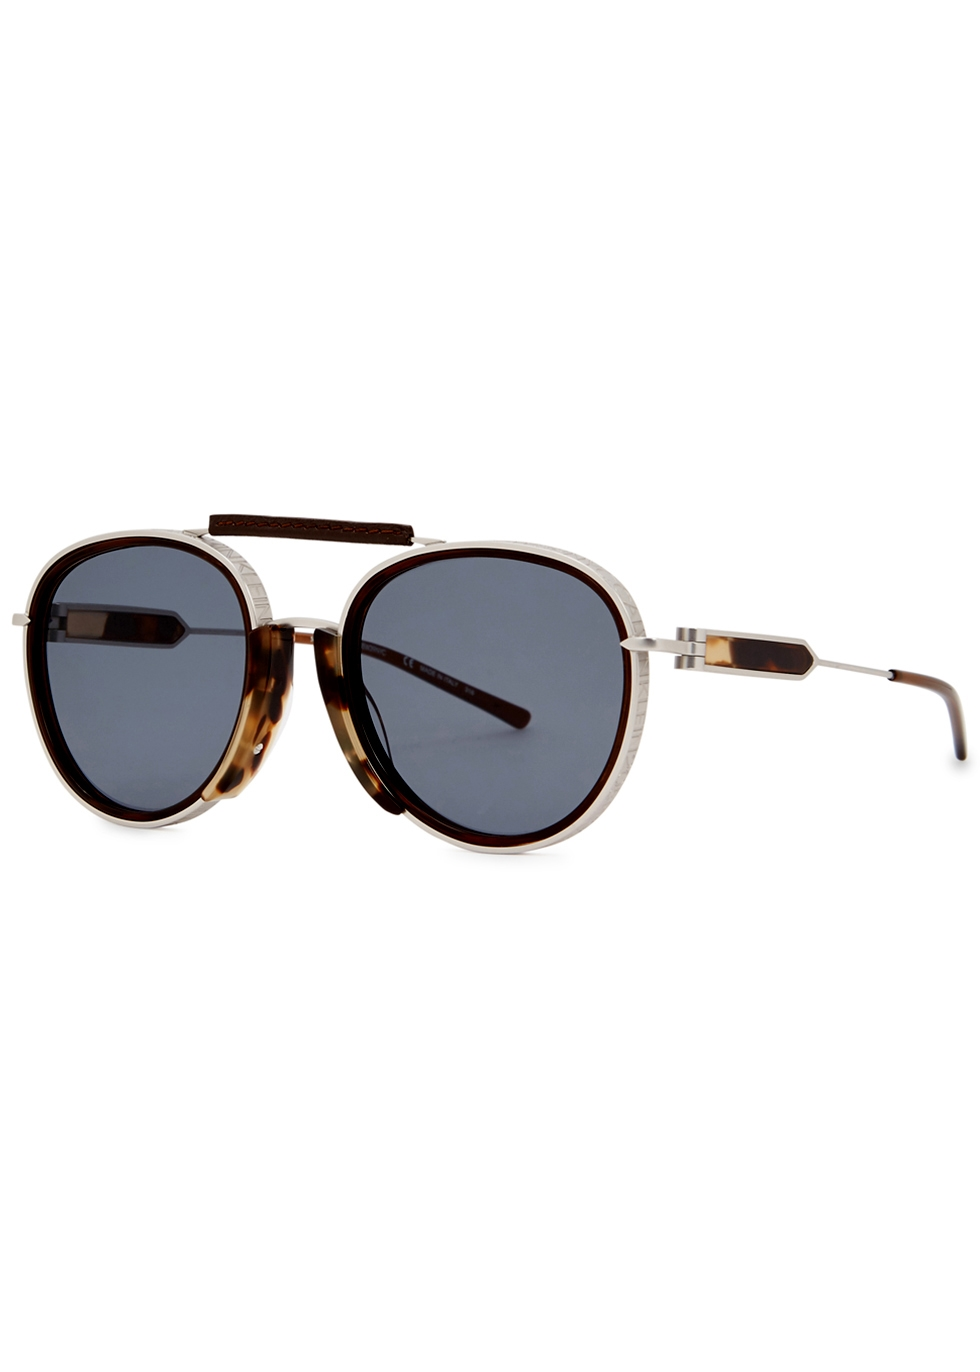 47868bc686a Men s Designer Sunglasses   Eyewear - Harvey Nichols